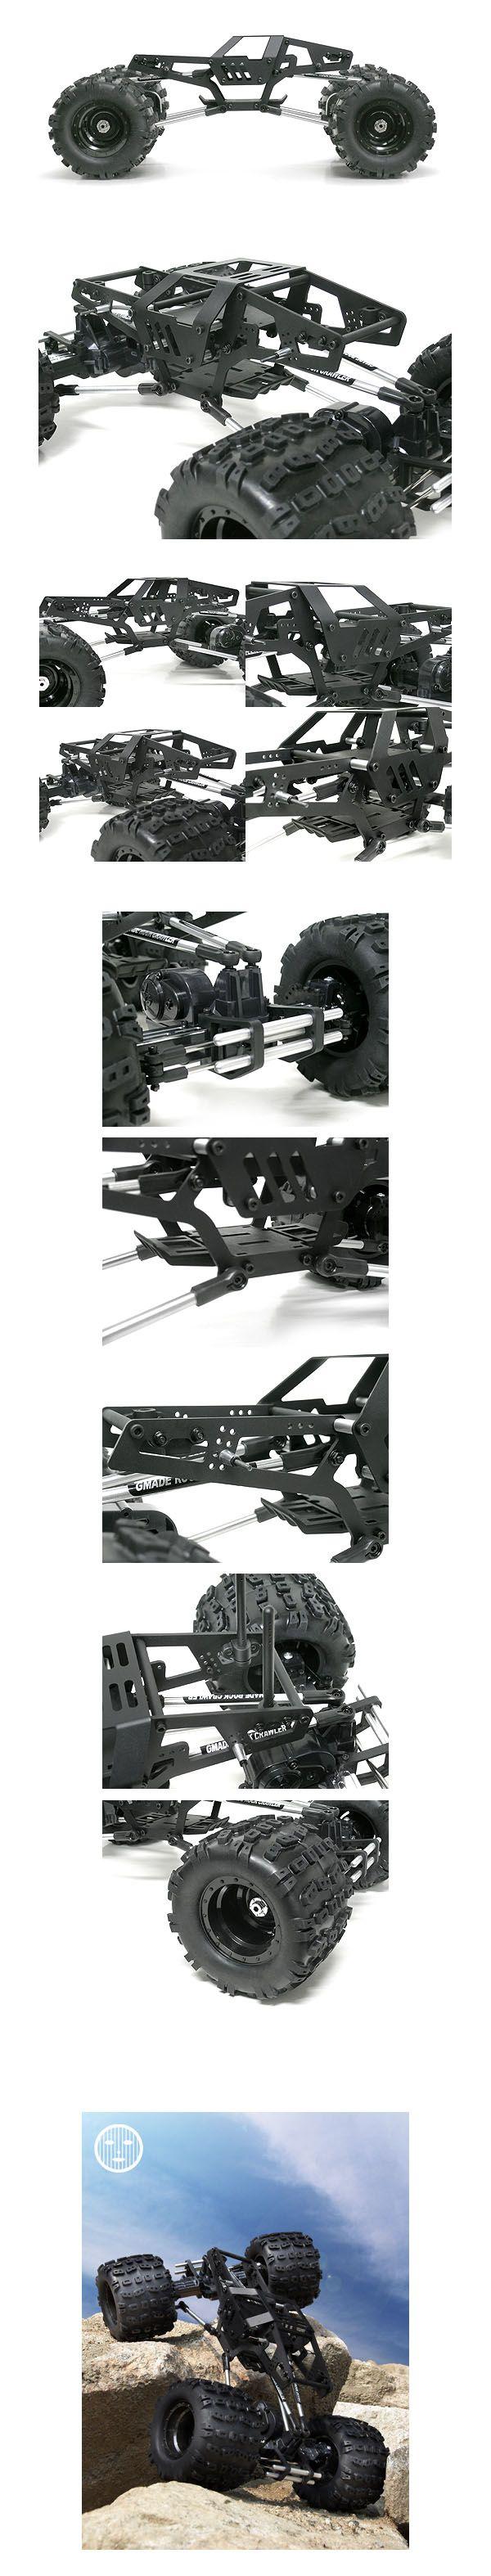 Stealth Rock Crawler Truck Kit(Discontinued) : Gmade Dealer Webstore